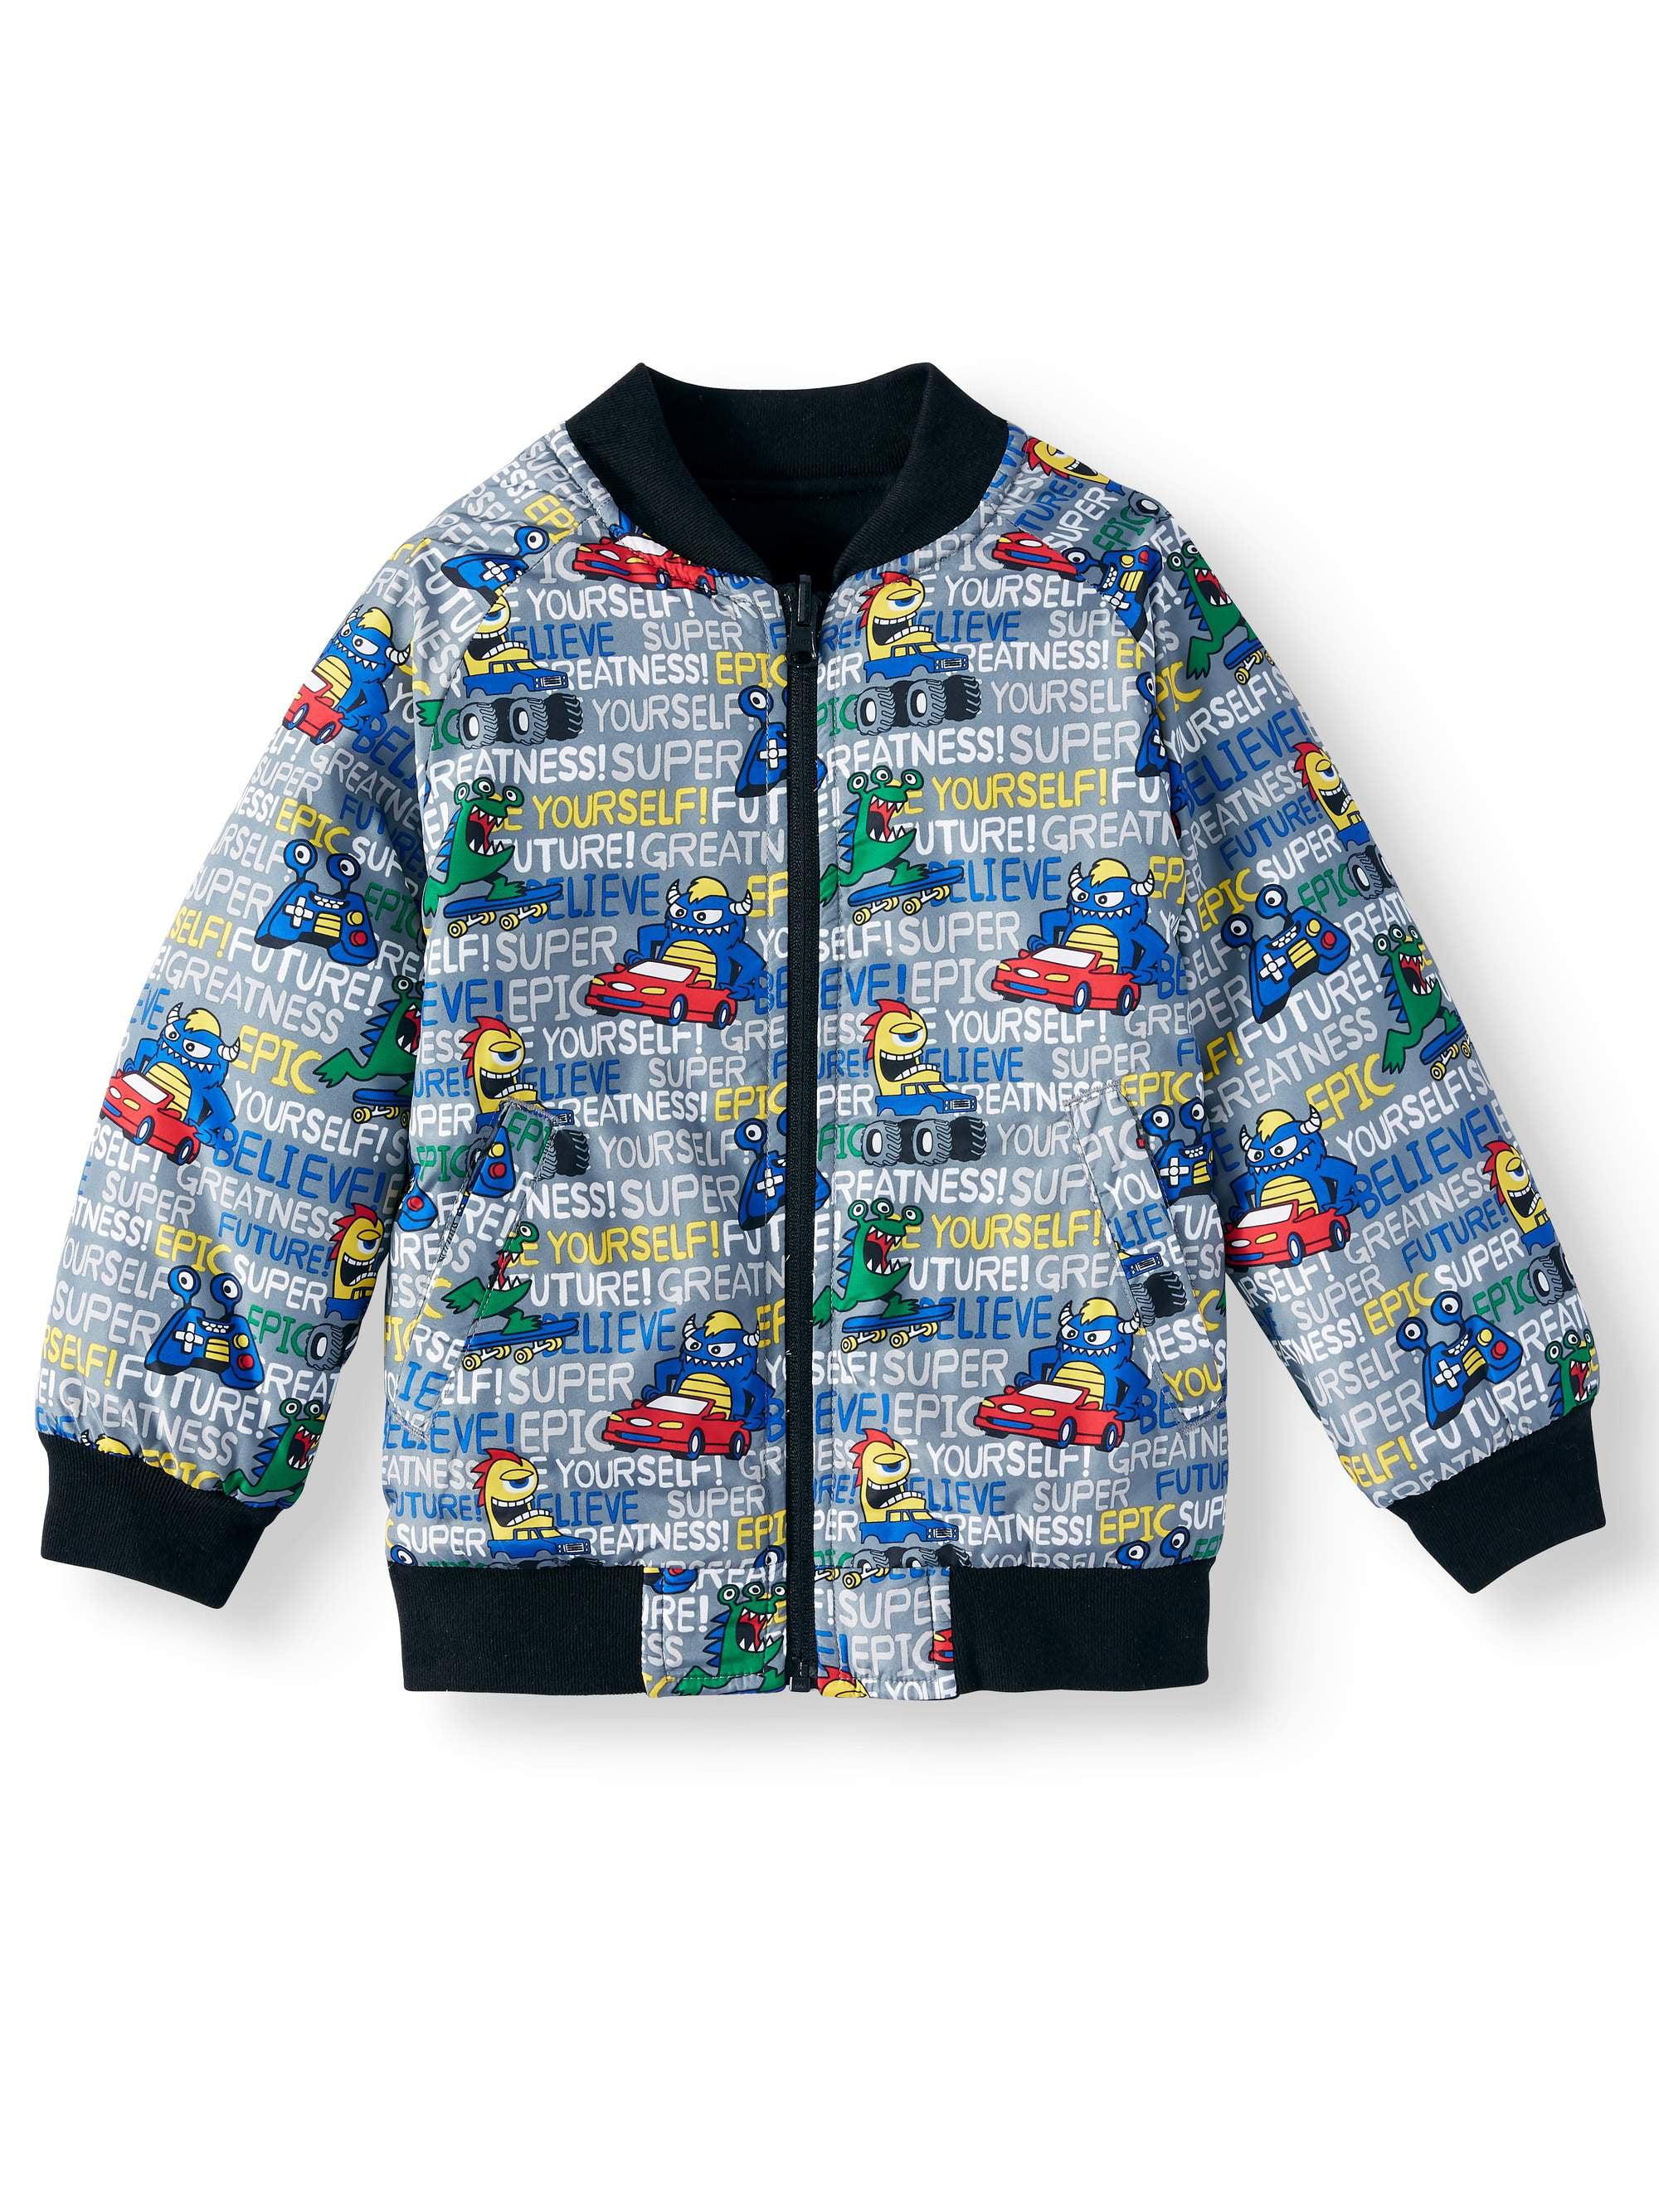 NWT 365 Kids Garanimals boys dinosaur spring fall reversible Windbreaker Jacket